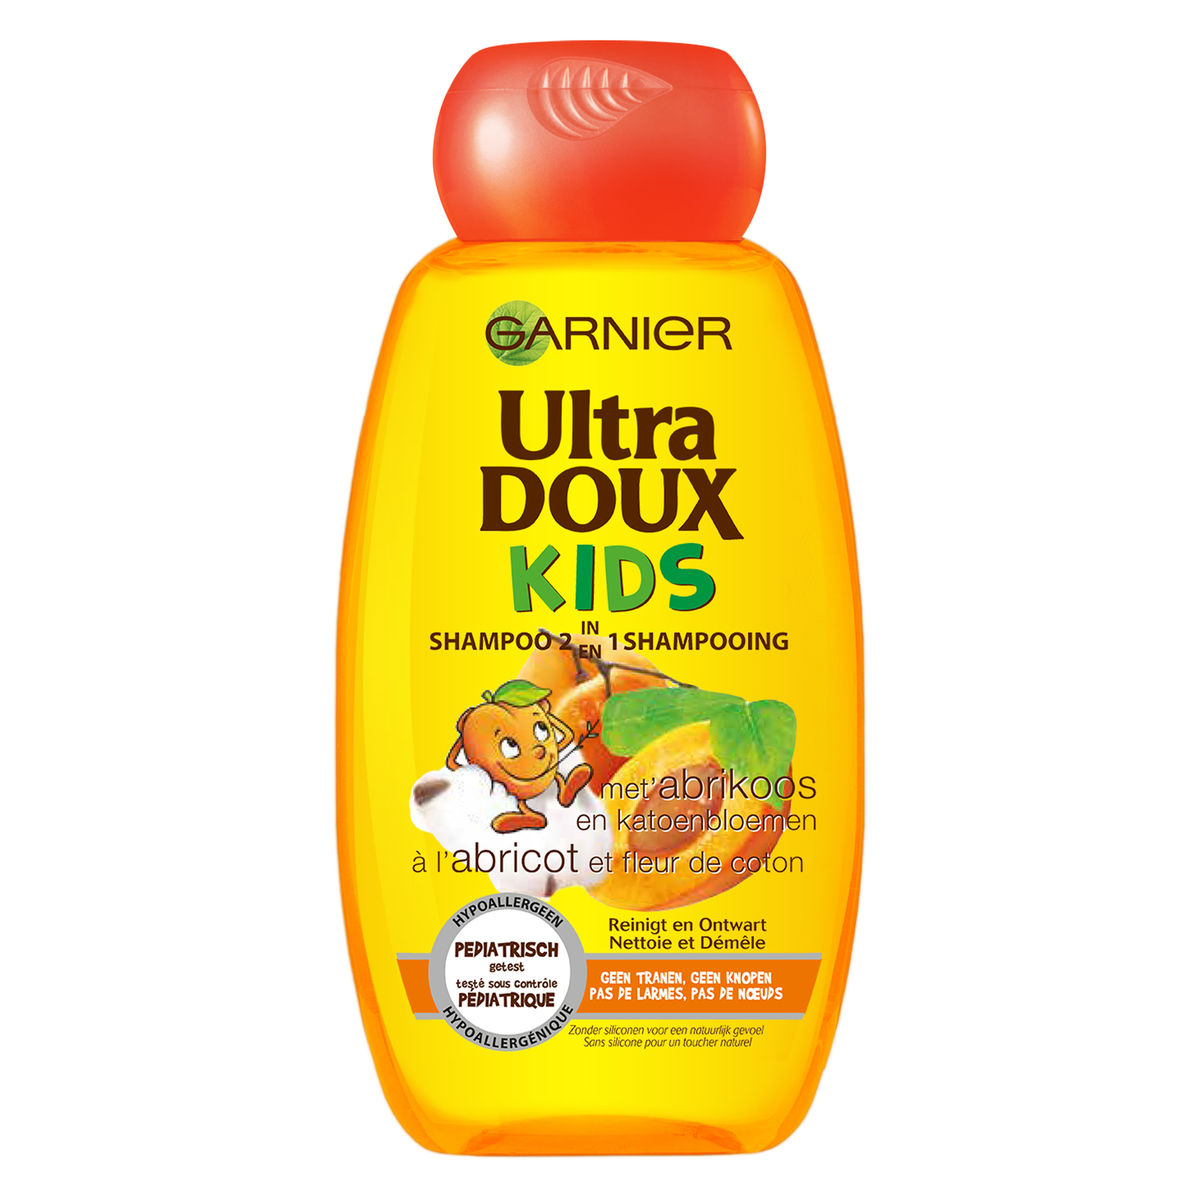 Garnier Ultra Doux Kids Abricot - Cheveux Normaux